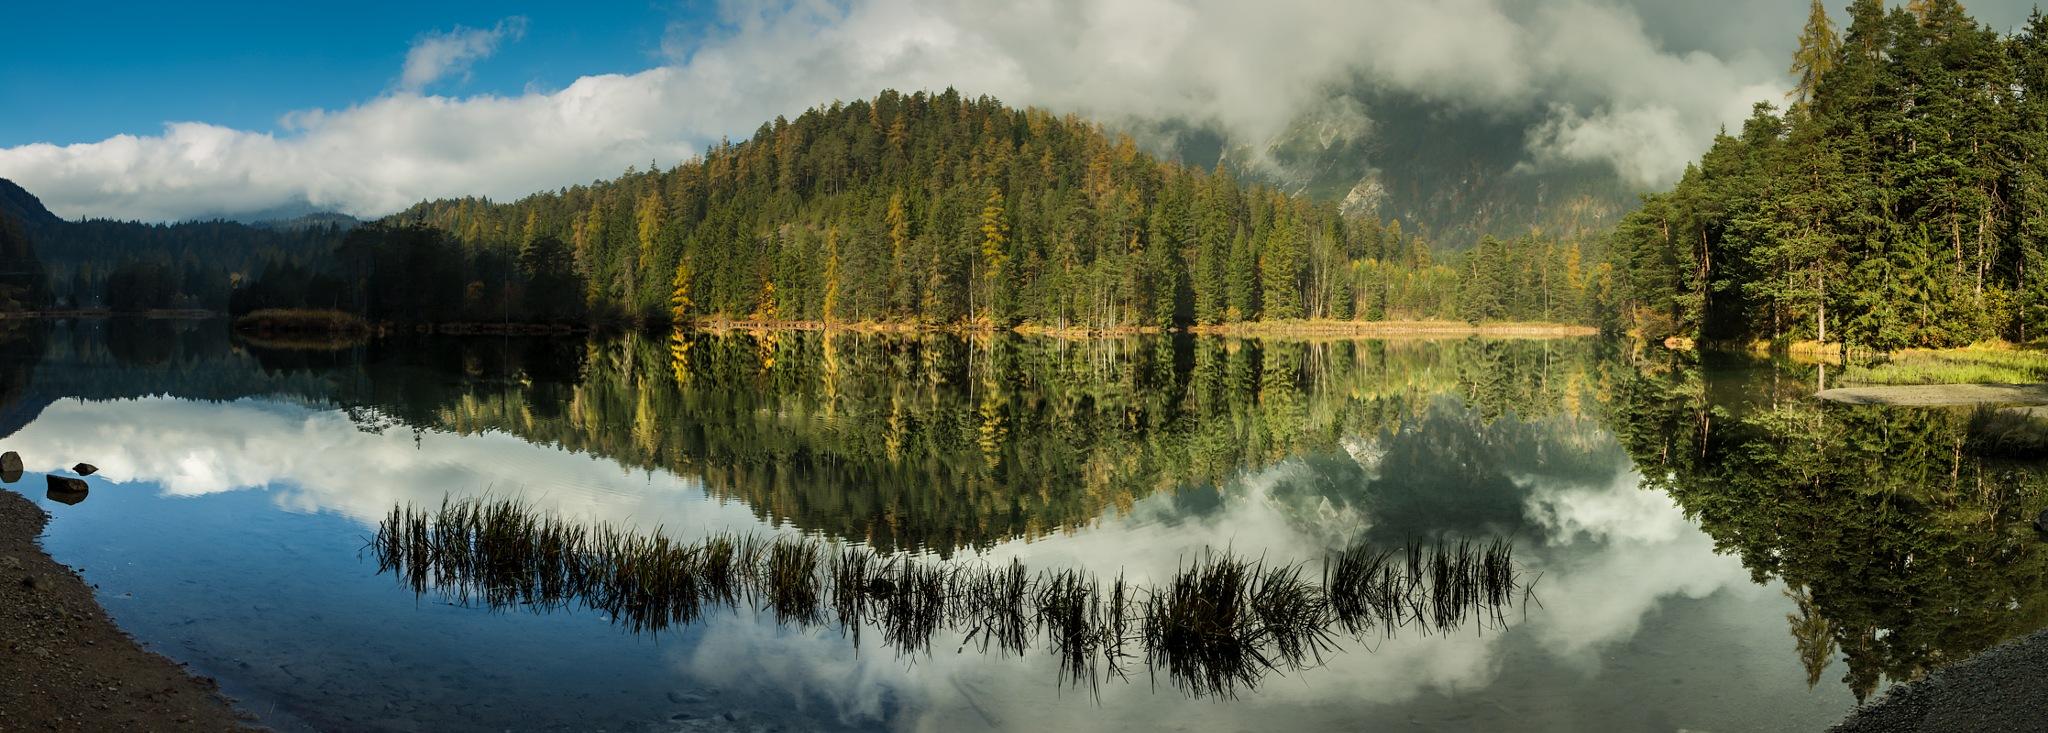 Fall Lake by Walter Quirtmair